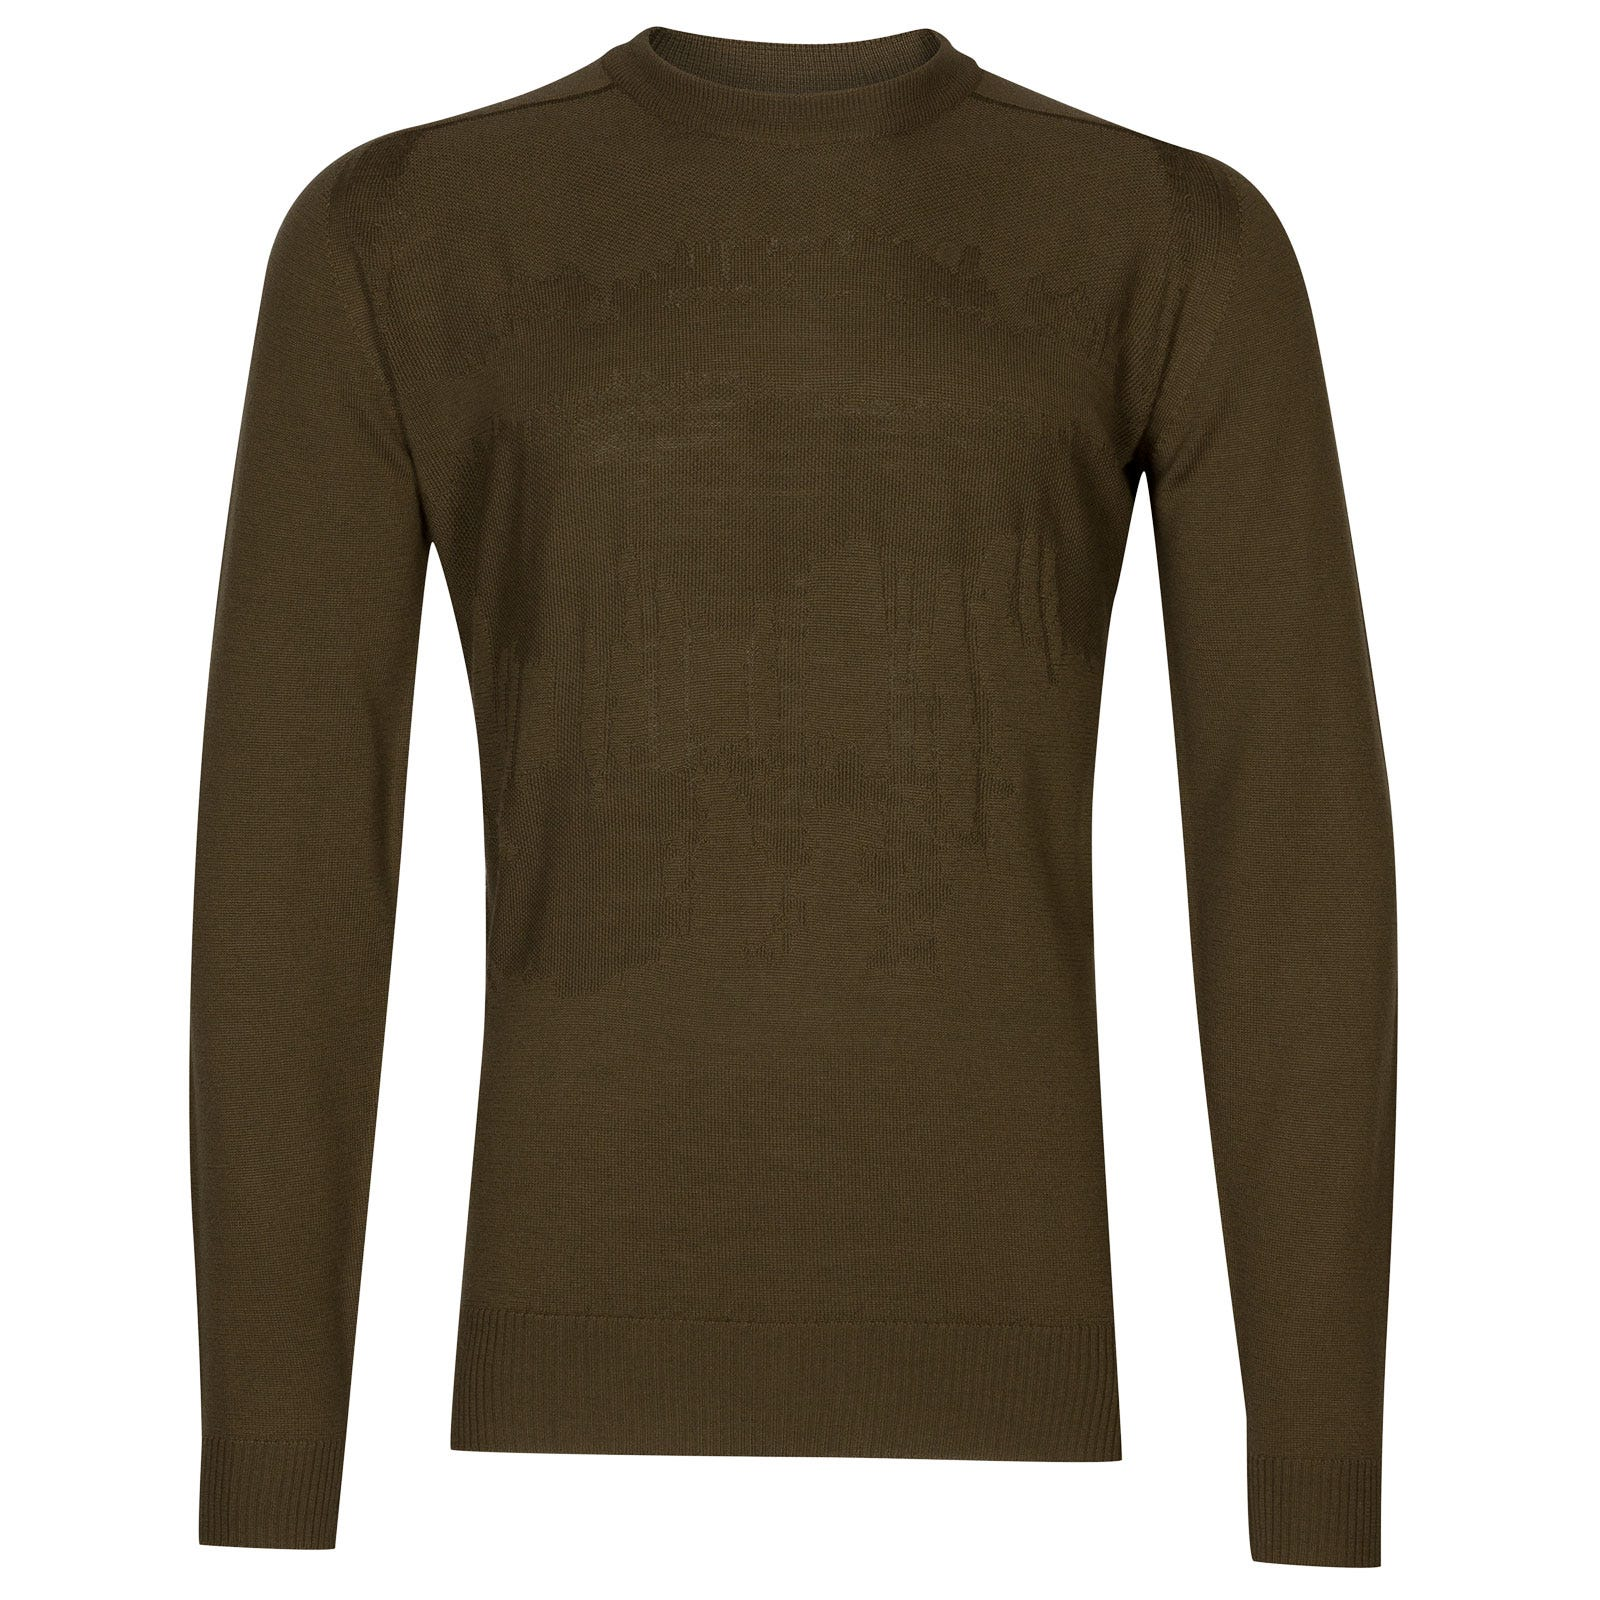 John Smedley sorbus Merino Wool Pullover in Kielder Green-L